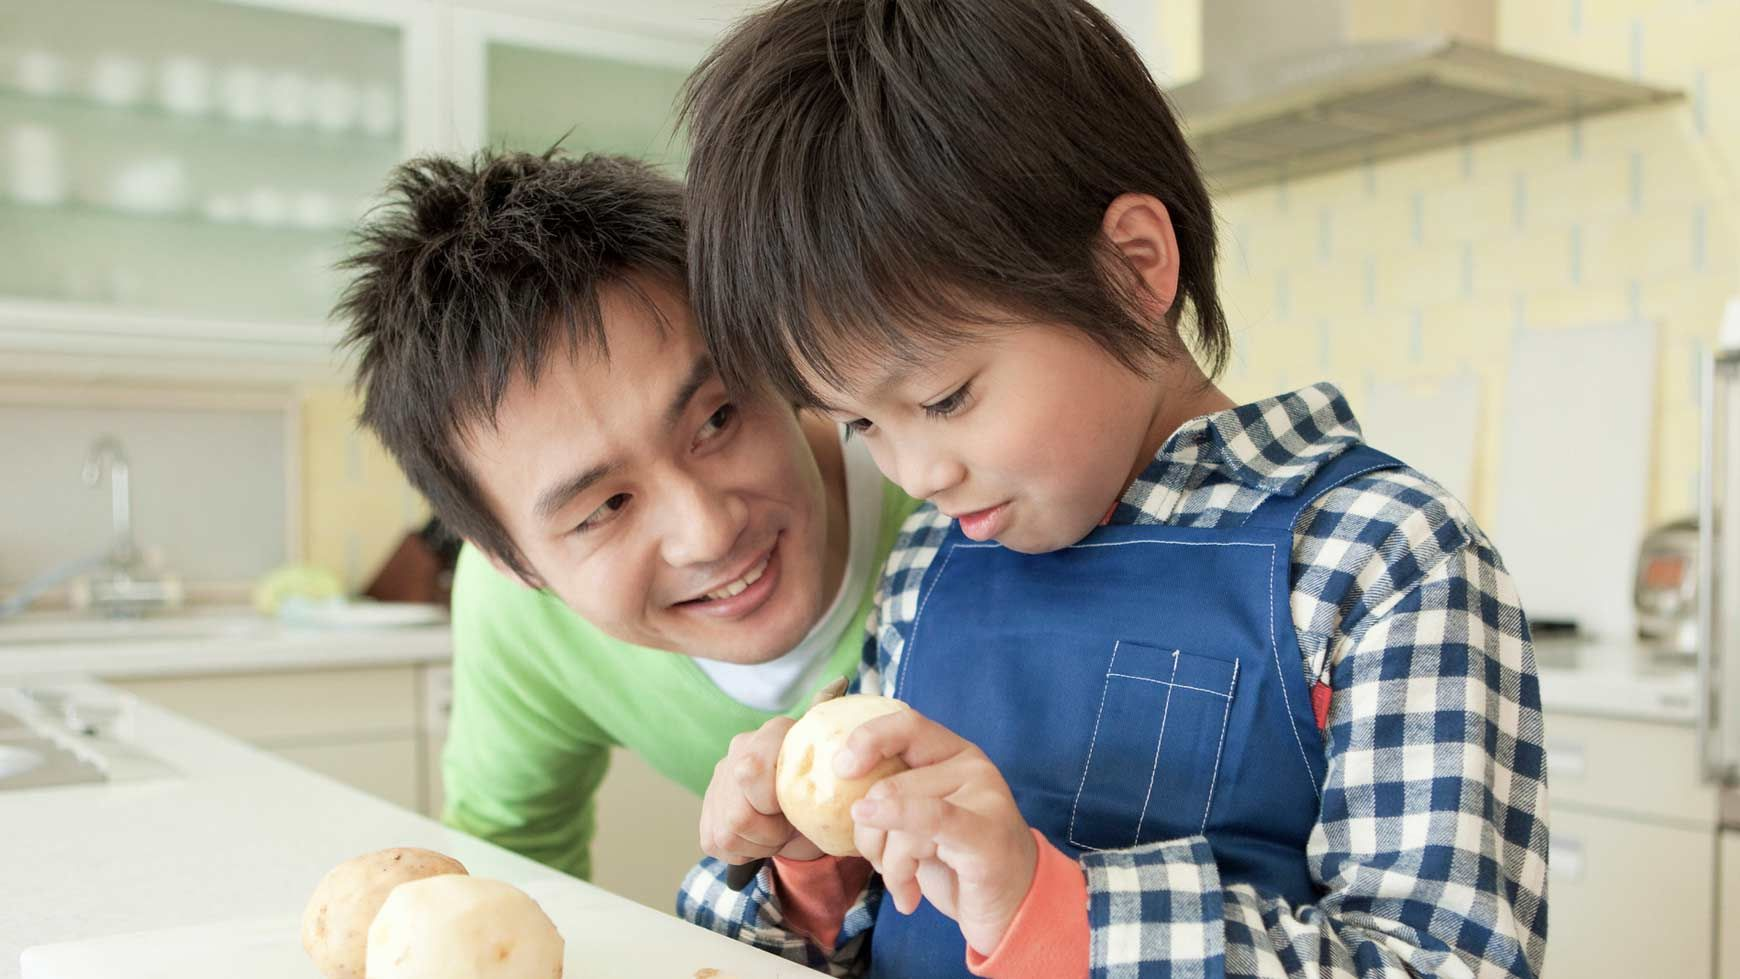 6 Ways To Help Your Child Develop Coping Skills